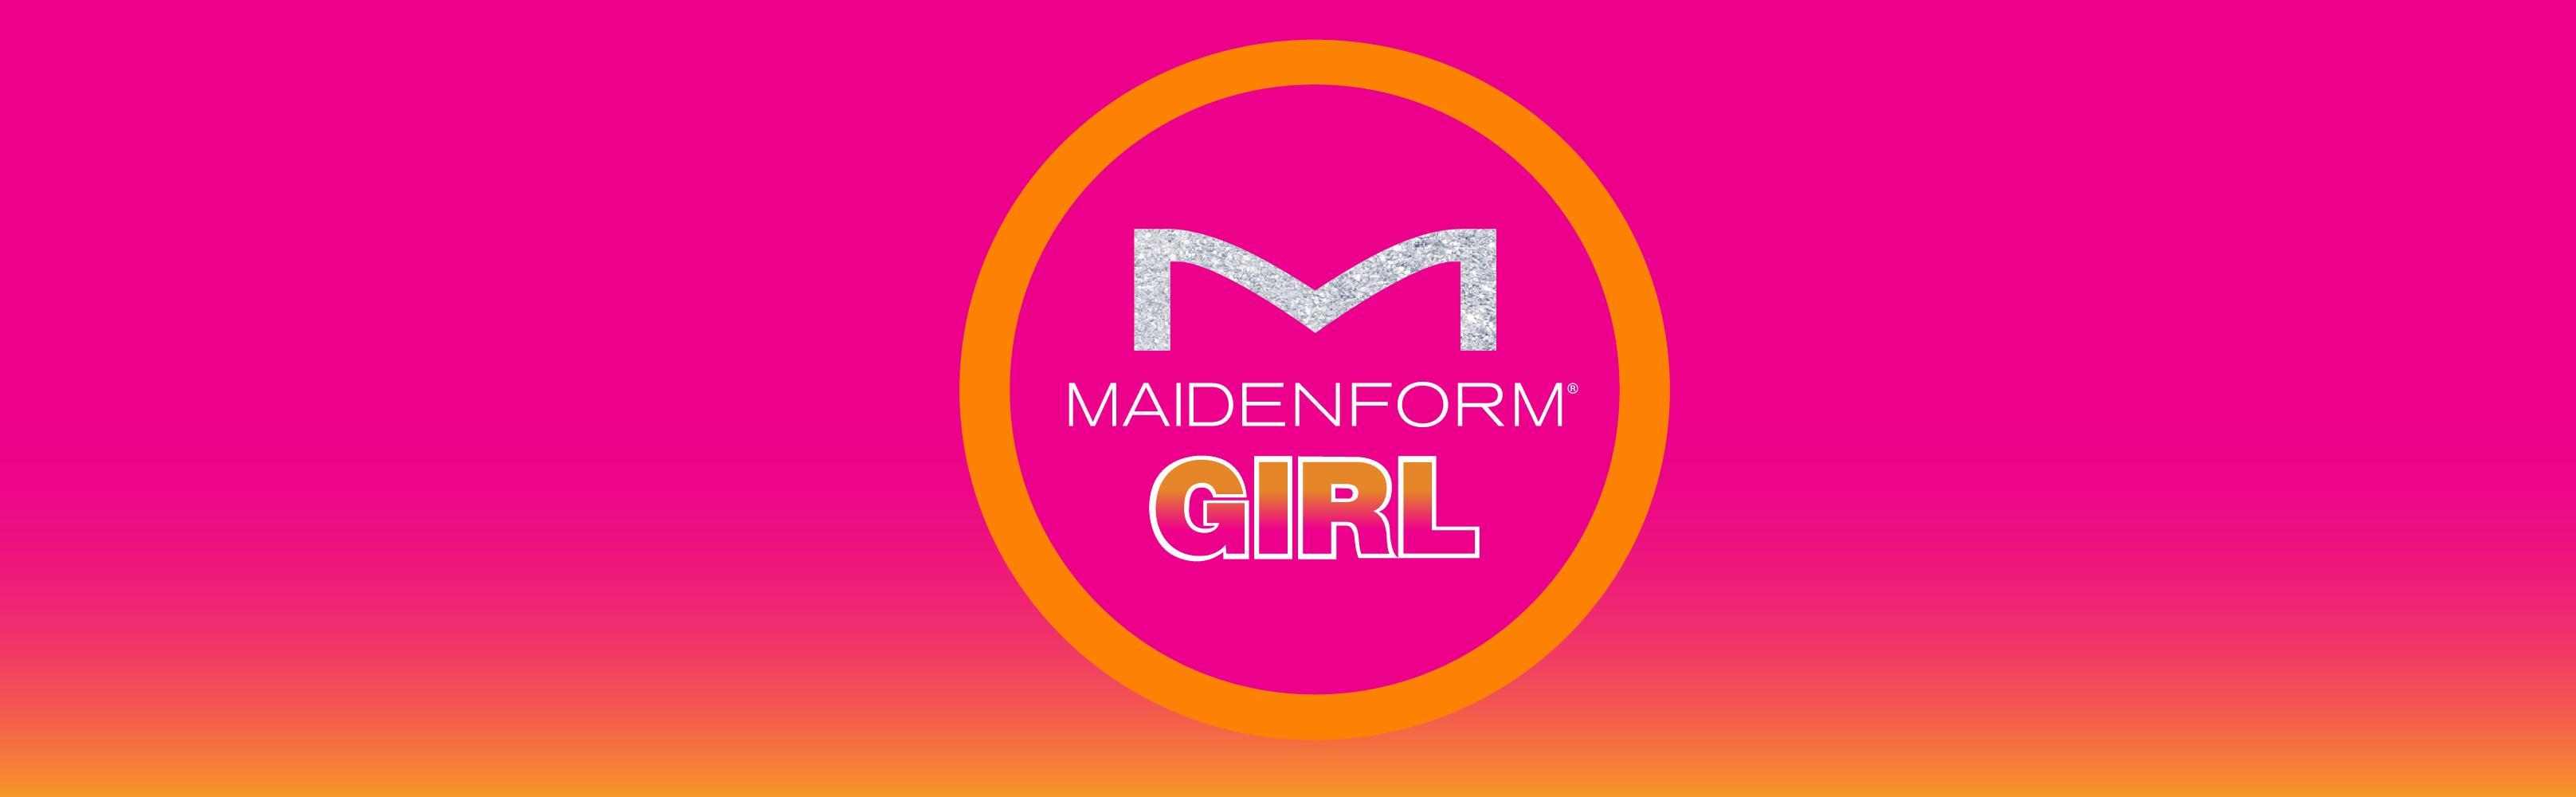 de35e28ea8 Amazon.com  Maidenform Girl Big Girls  Slim Softi Cup Bra  Clothing